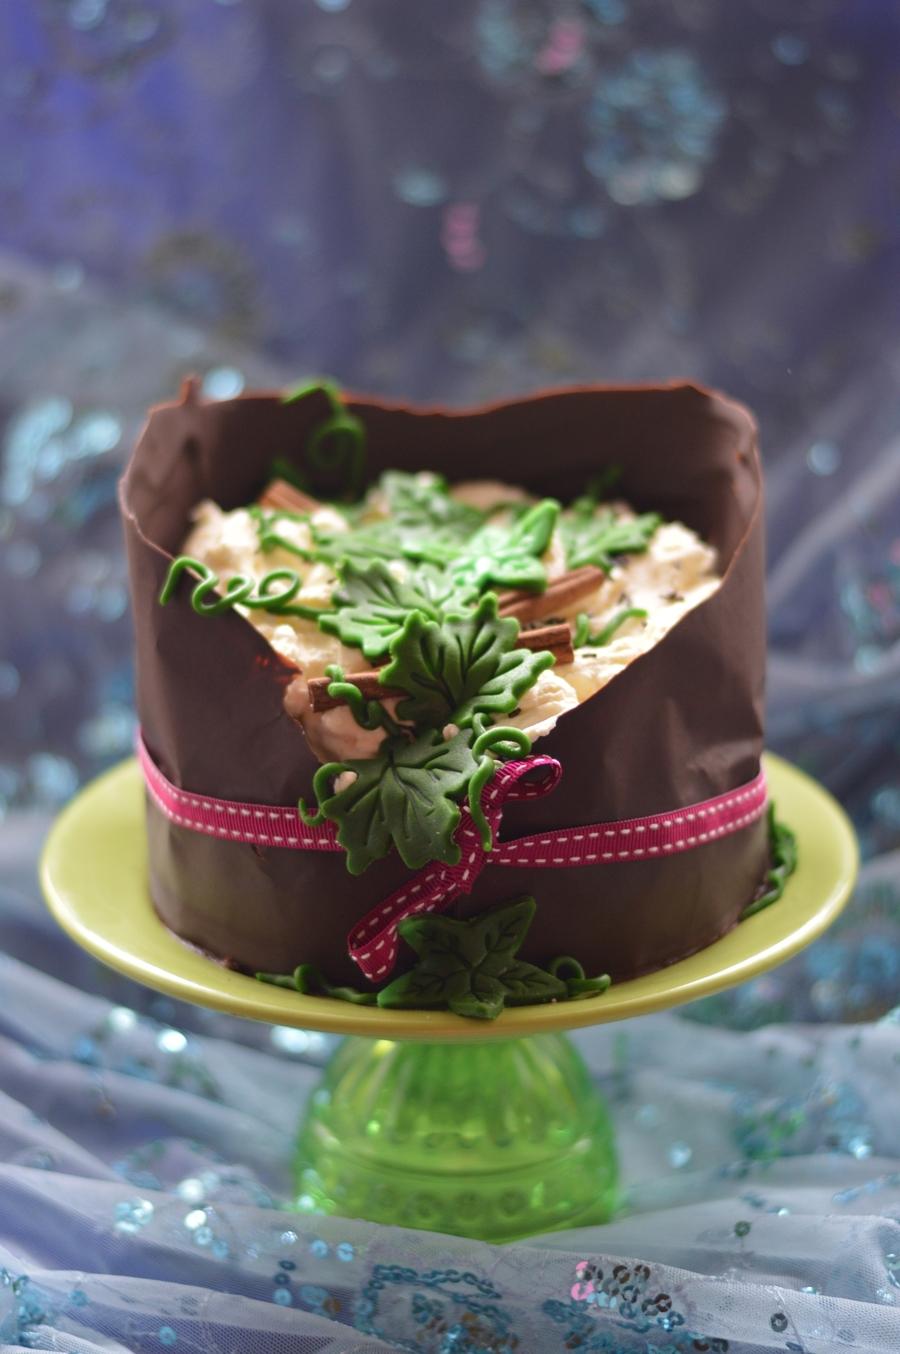 Cake Decorating Ivy Leaves : Ivy Cake - CakeCentral.com